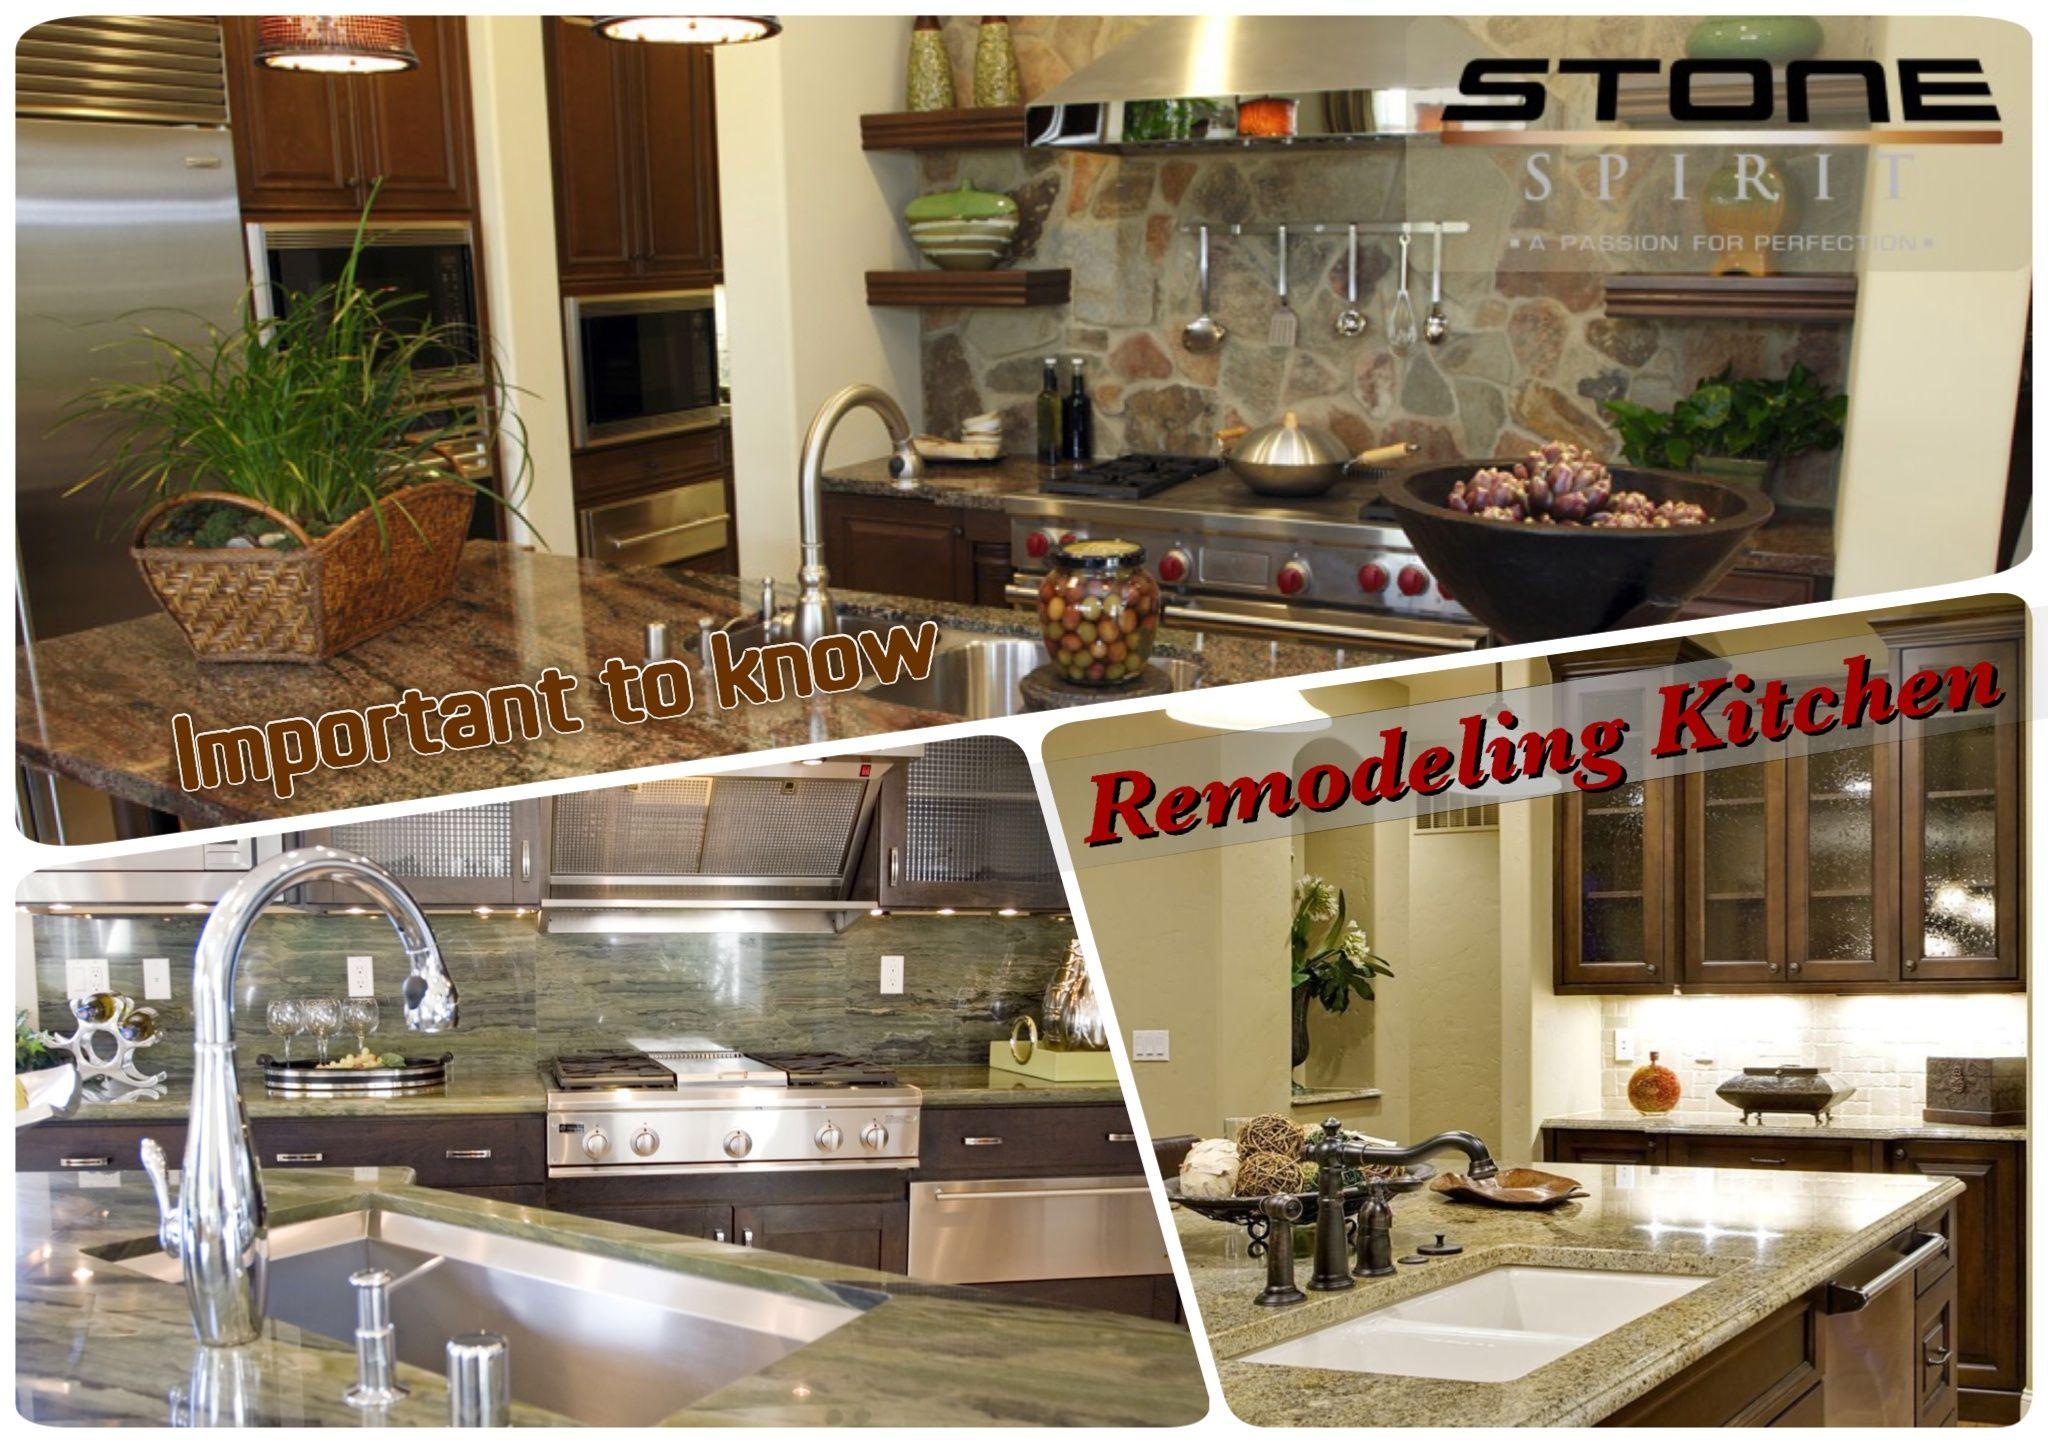 The best countertops for busy kitchens navigatorspbfo